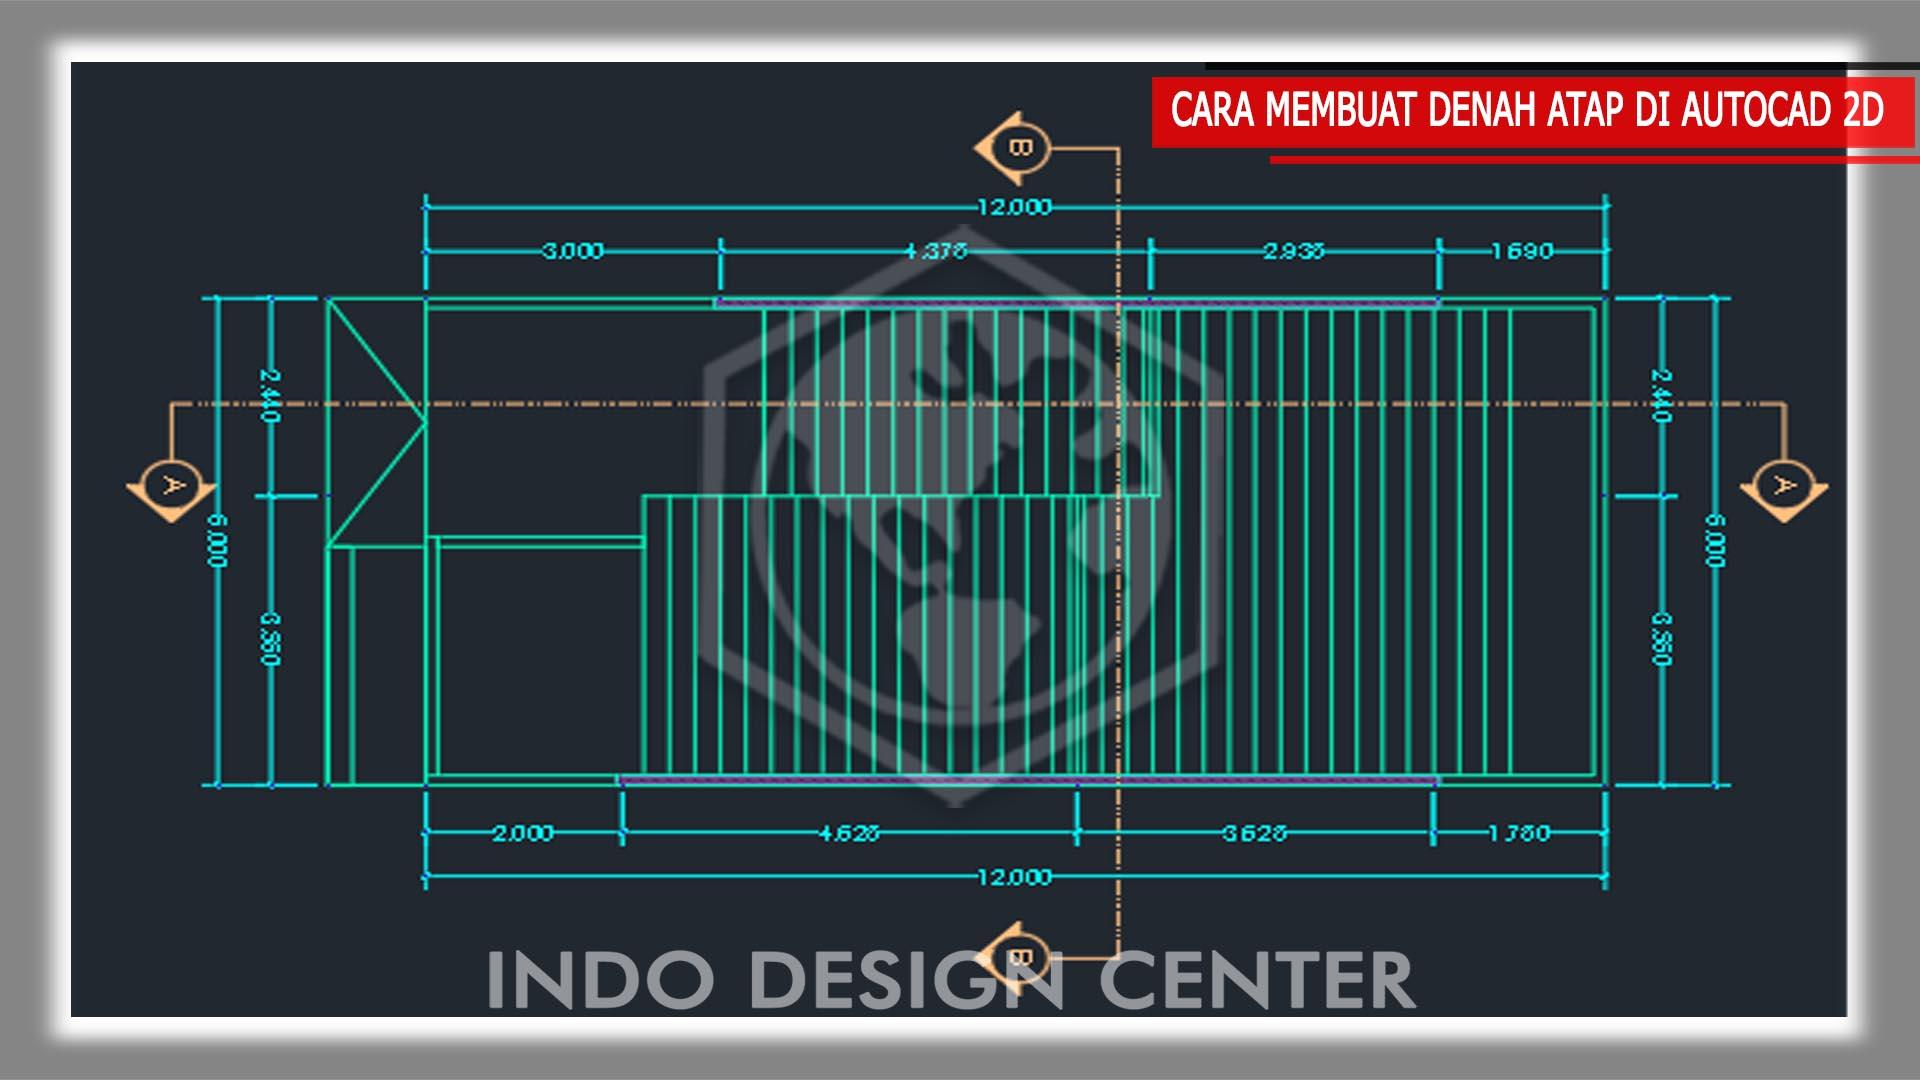 Cara Membuat Denah Atap Limas Di Autocad Belajar Dasar Autocad Kursus Privat Autocad 2d 3d 3d Max Sap2000 Etabs Rab Tekla Kursus Desain Interior Eletrikal Sketchup Mesin Dan Industri Kursus